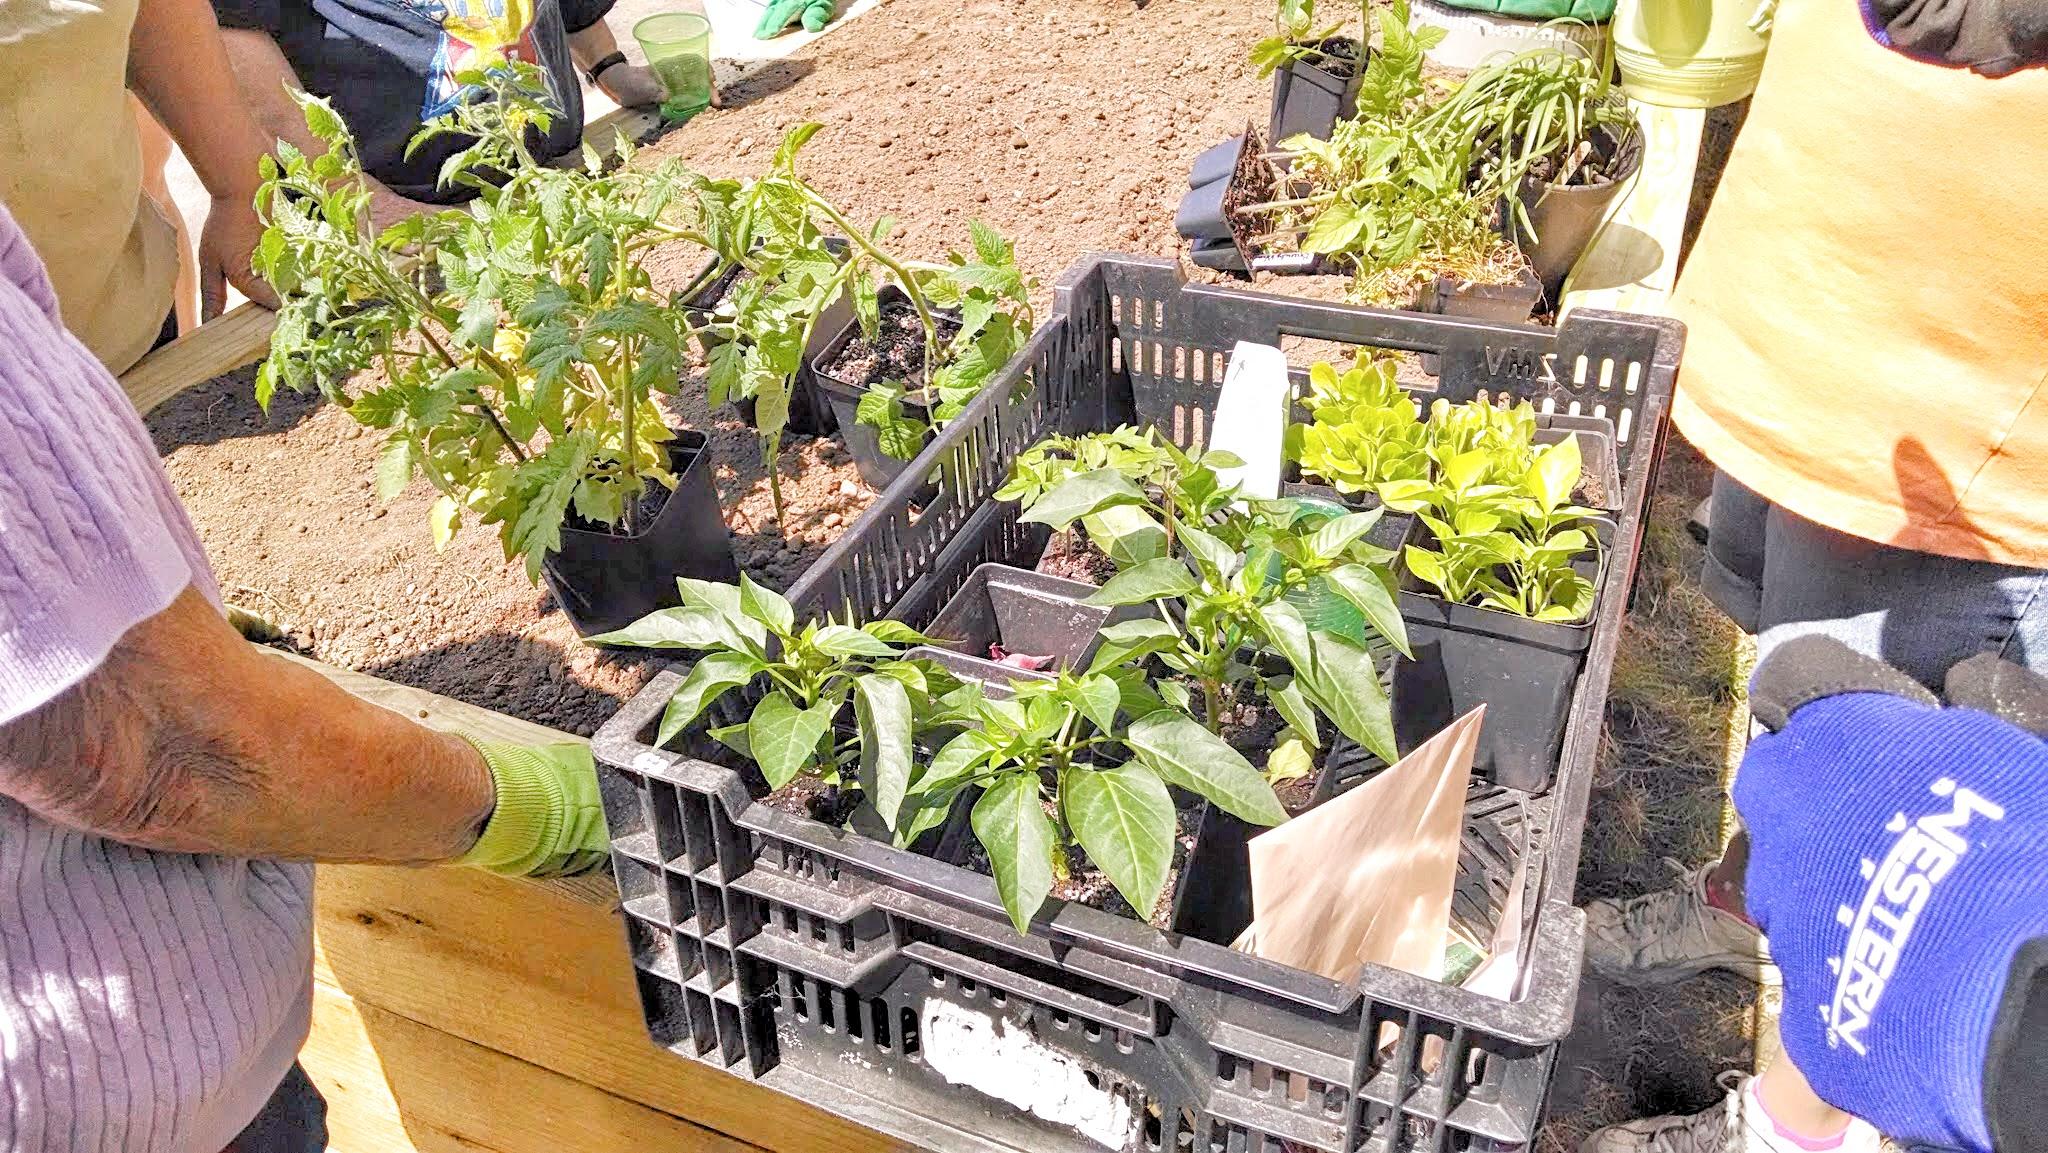 Gardening Through Community